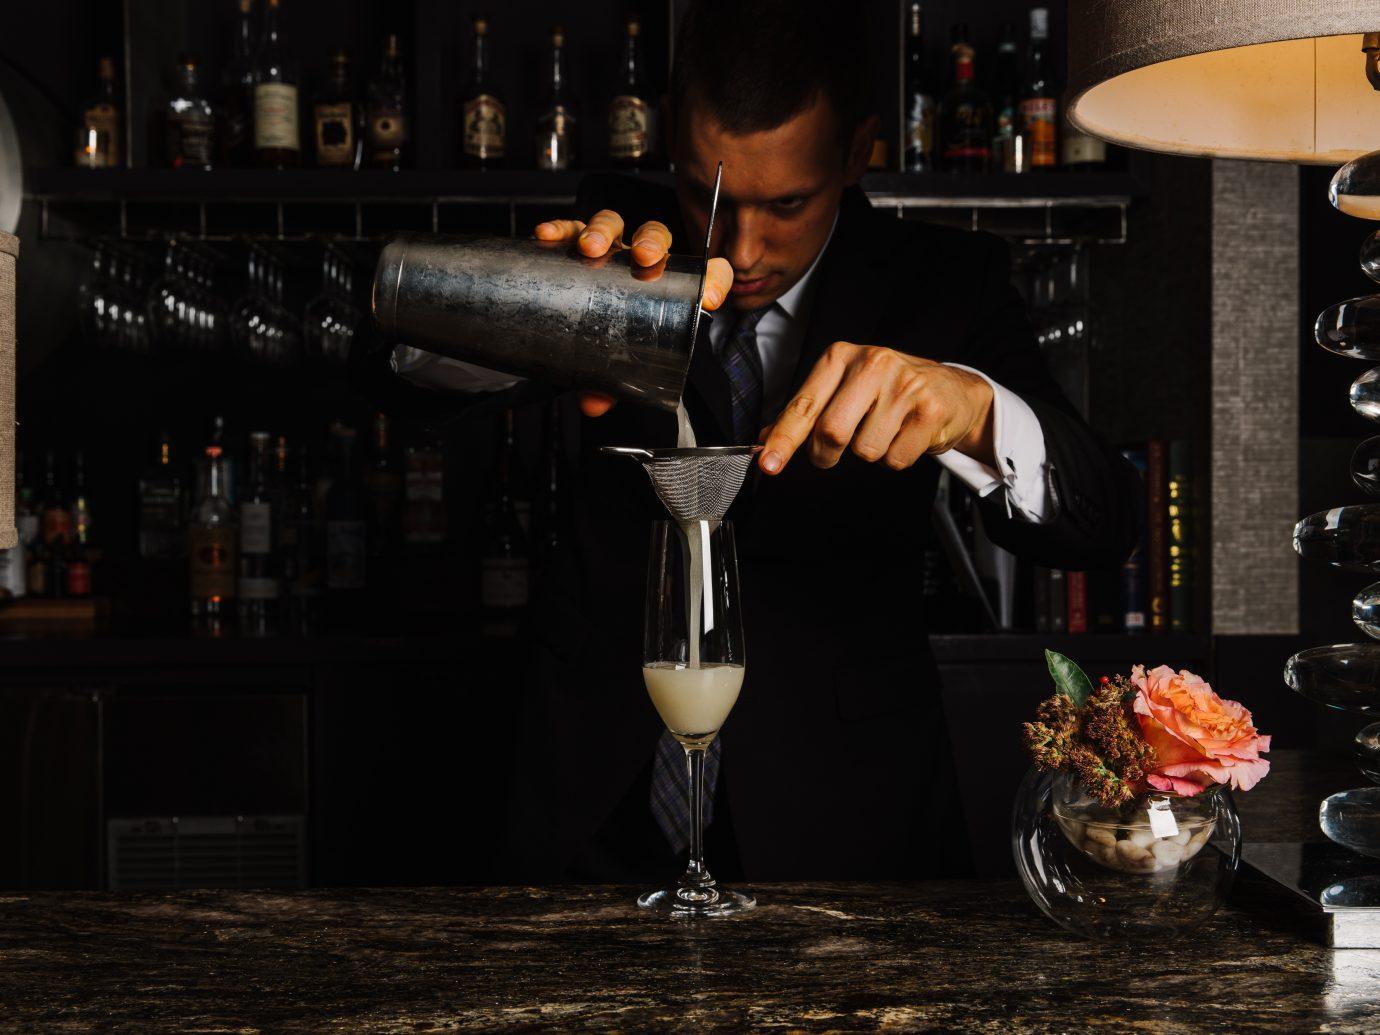 Man straining cocktail in dim lighting